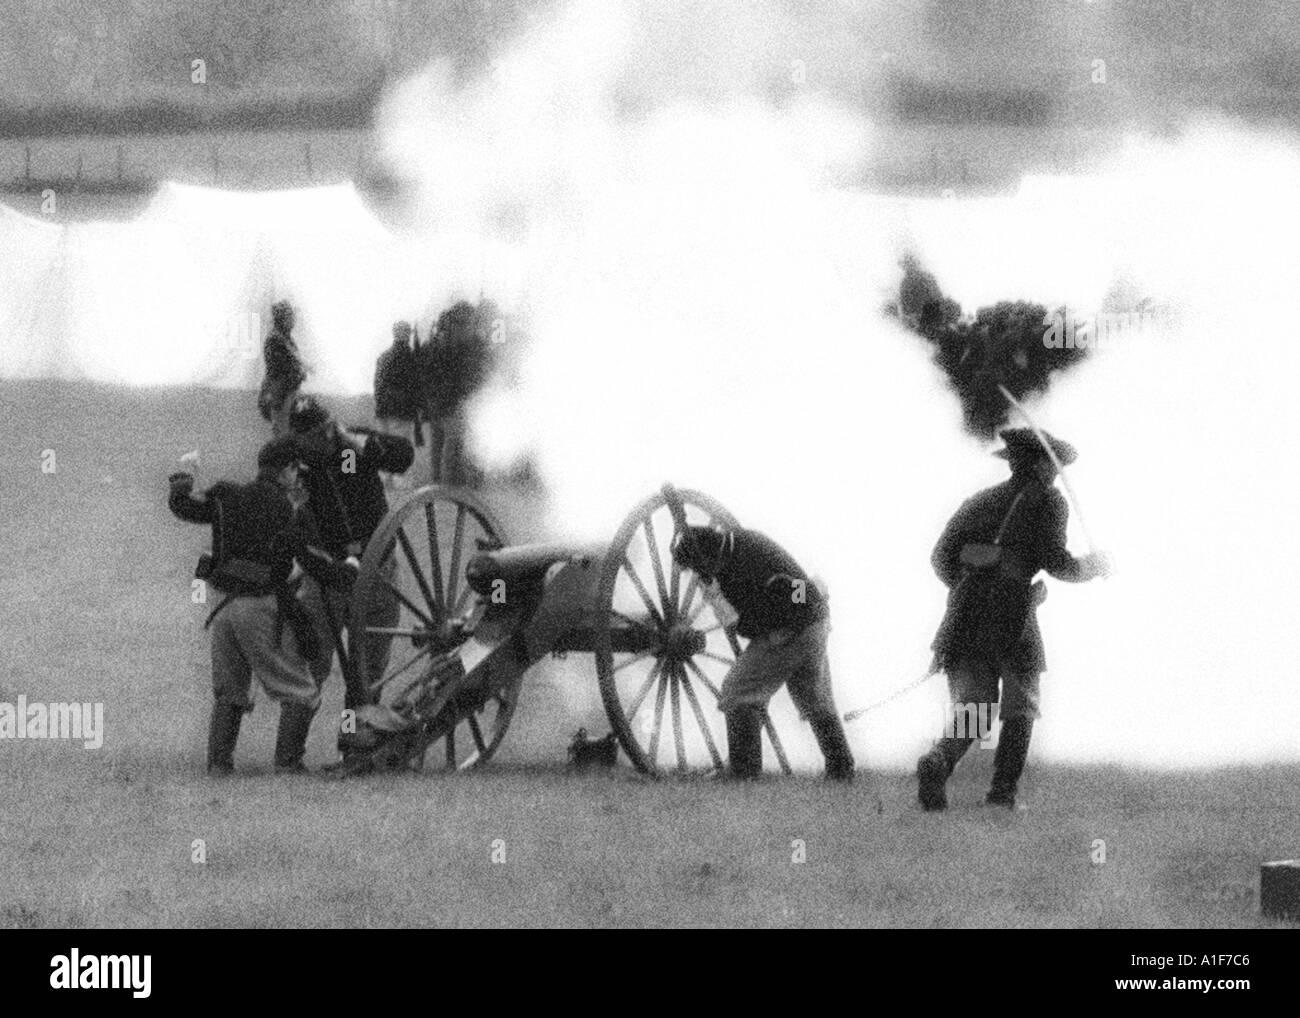 American Civil War cannon firing - Stock Image